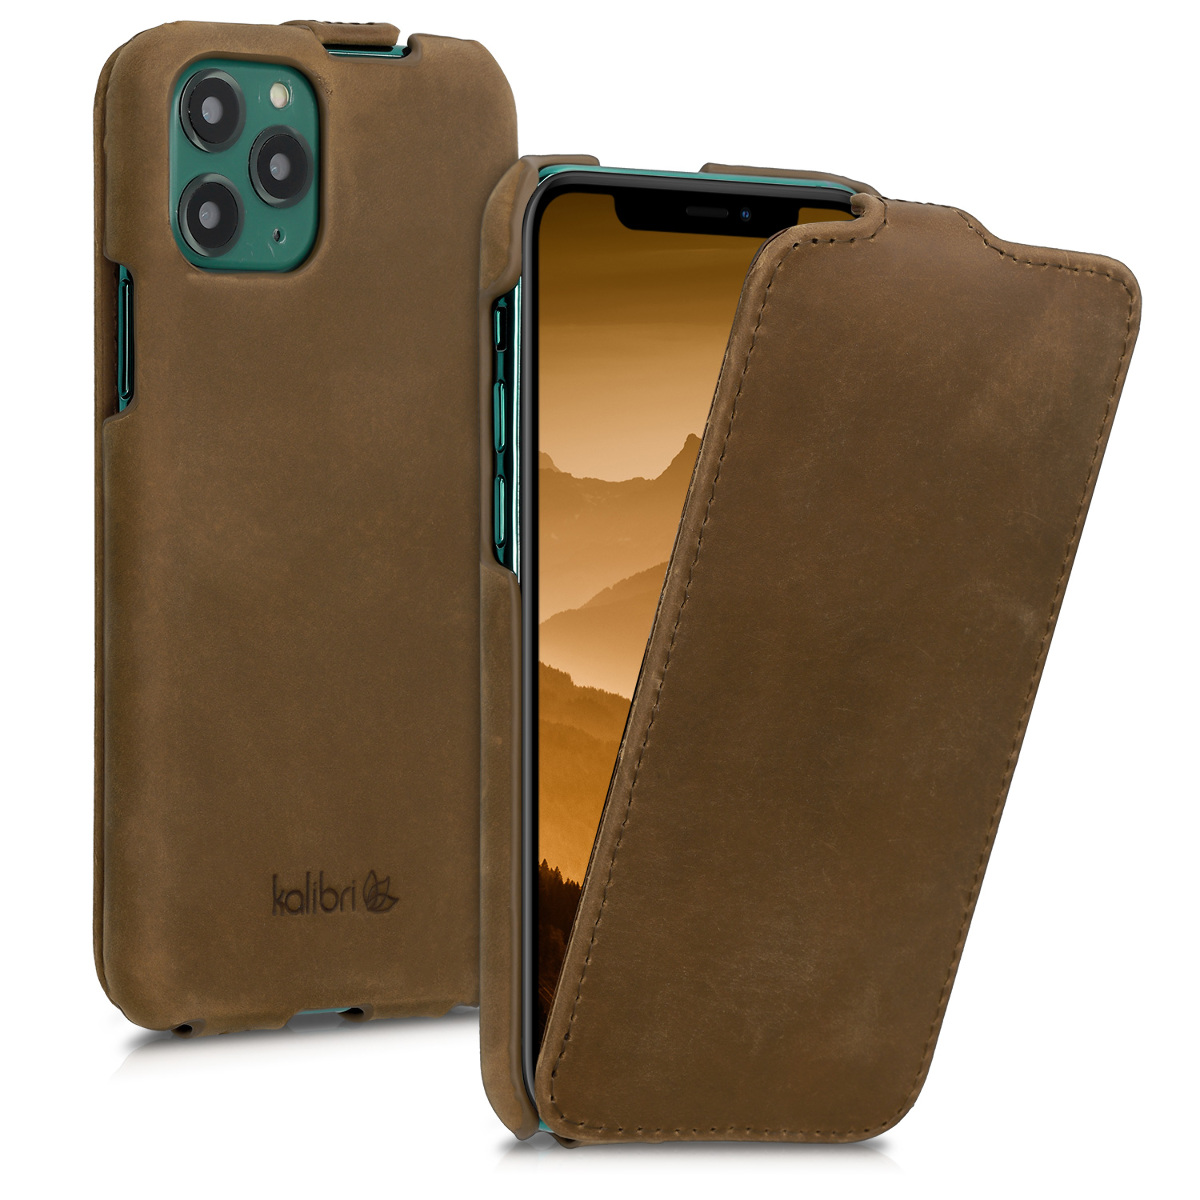 Kalibri Δερμάτινη Θήκη Flip Apple iPhone 11 Pro - Ultra Slim Leather Protective Phone Cover - Brown (49807.05)